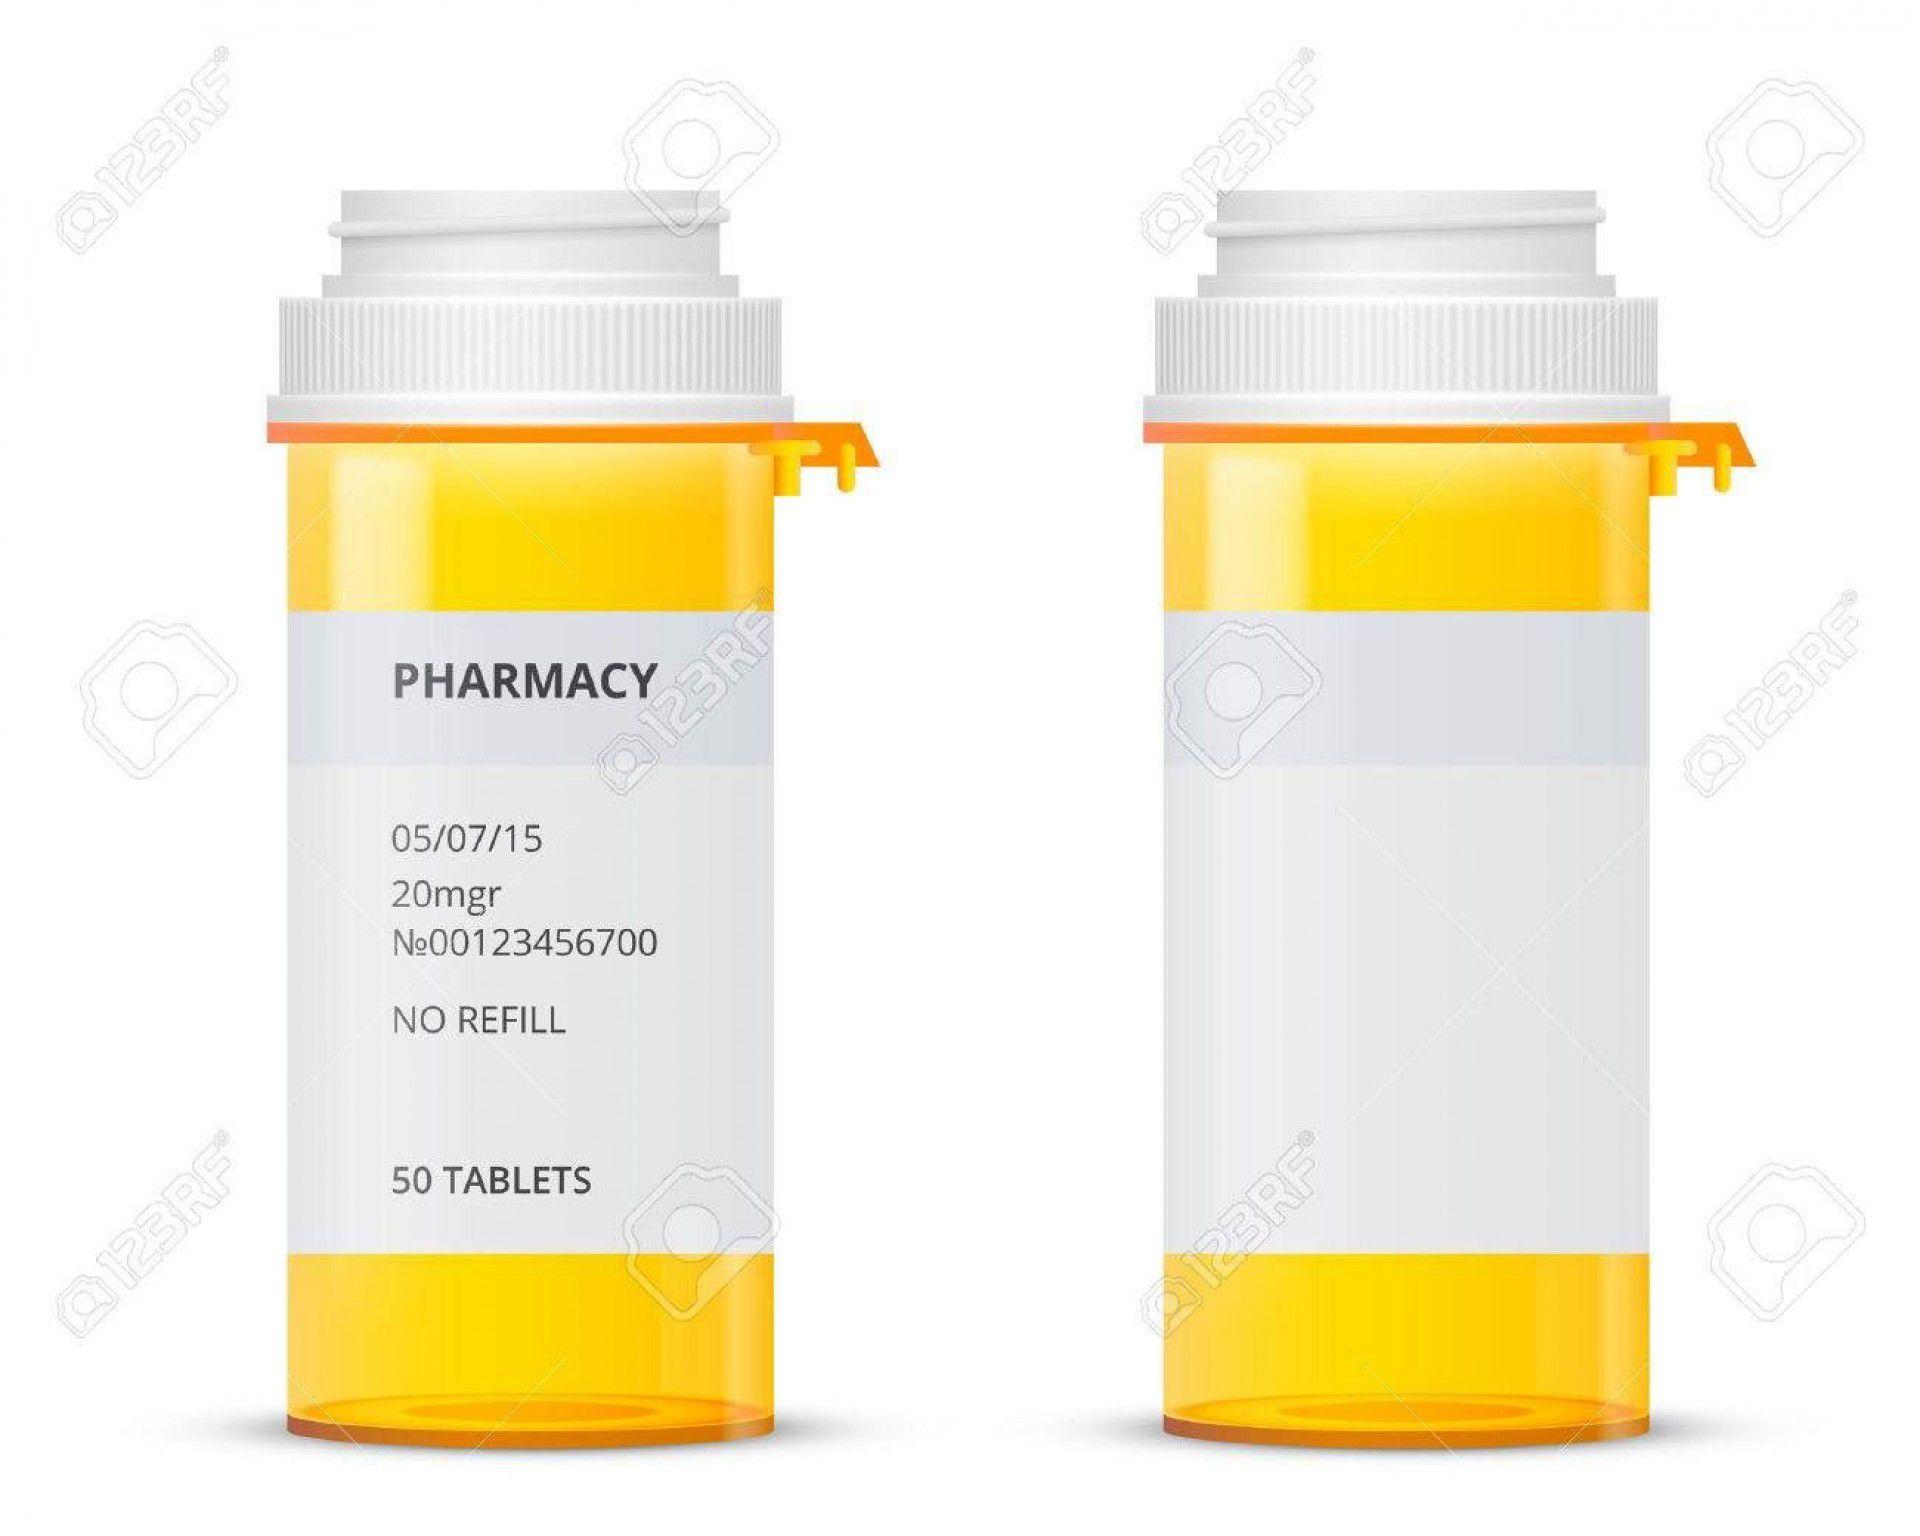 003 Surprising Fake Prescription Bottle Label Template Picture Full